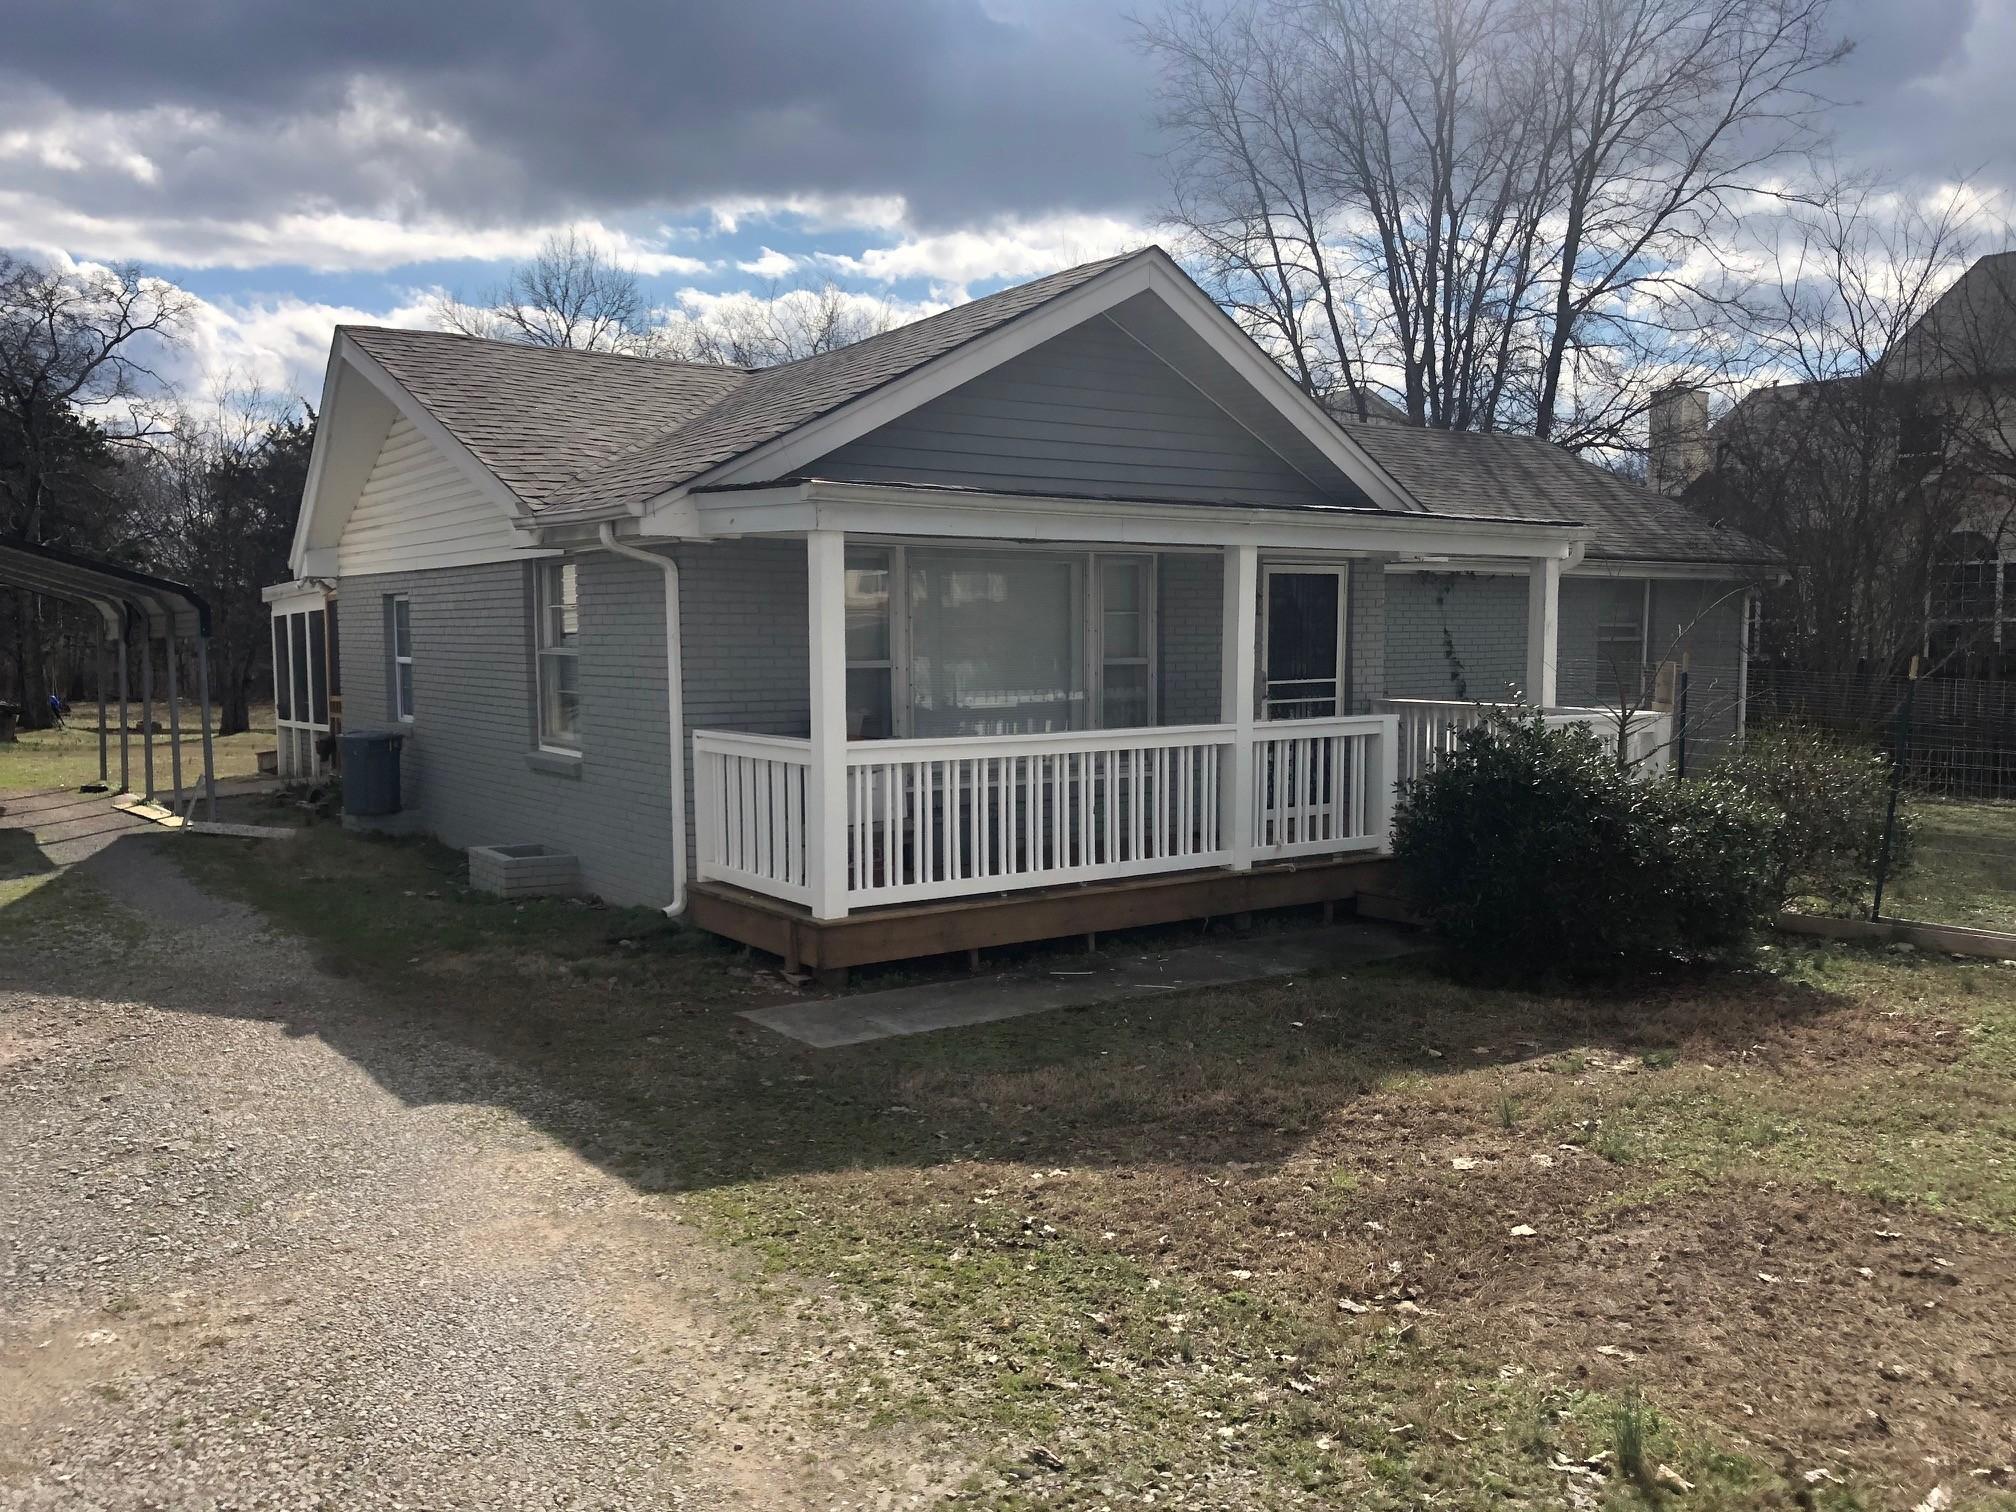 6324 Mount View Rd, Antioch, TN 37013 - Antioch, TN real estate listing